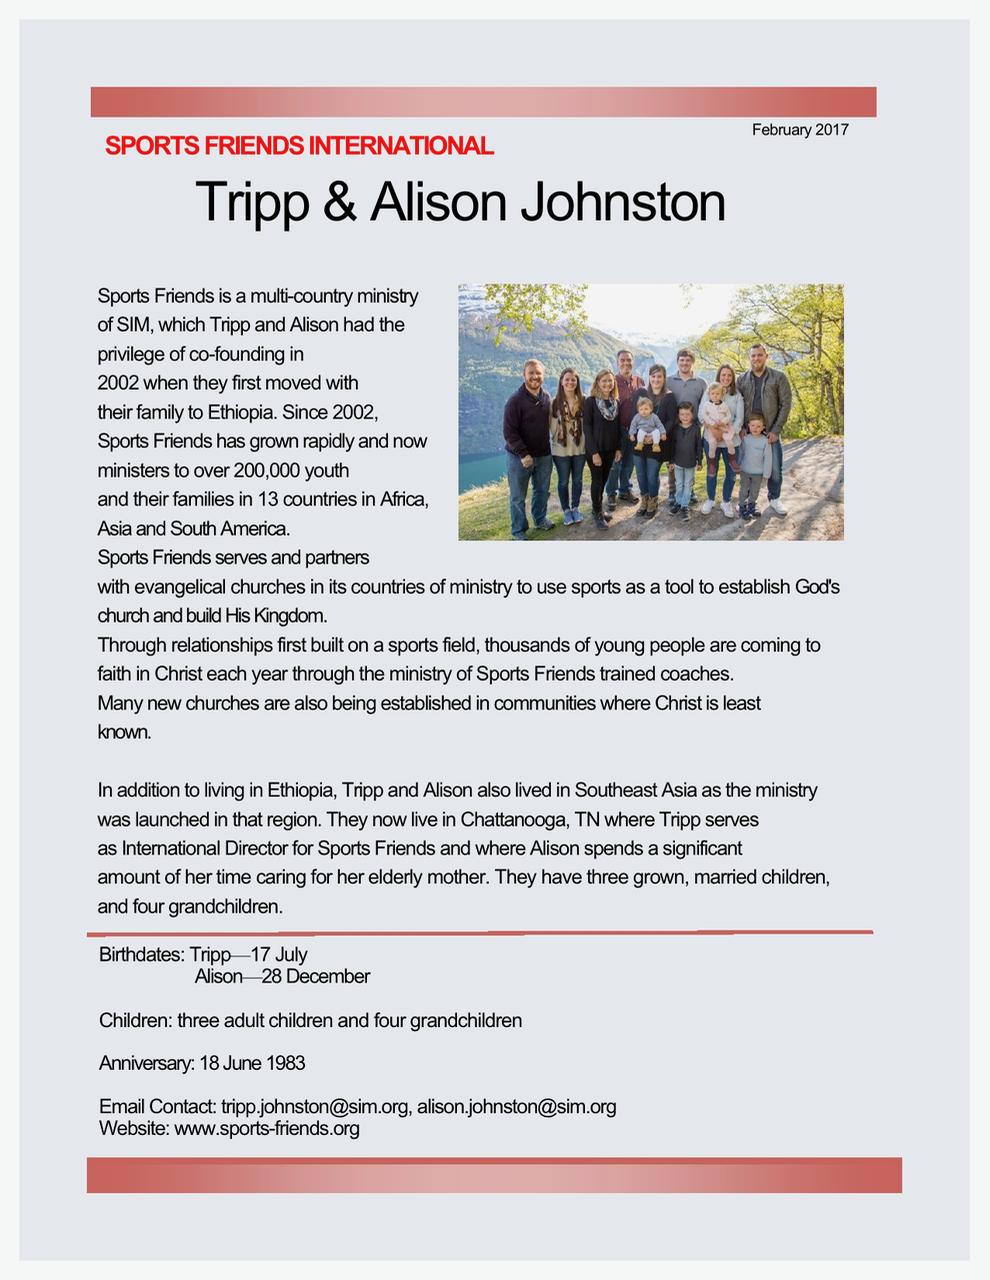 Tripp and Alison Johnston